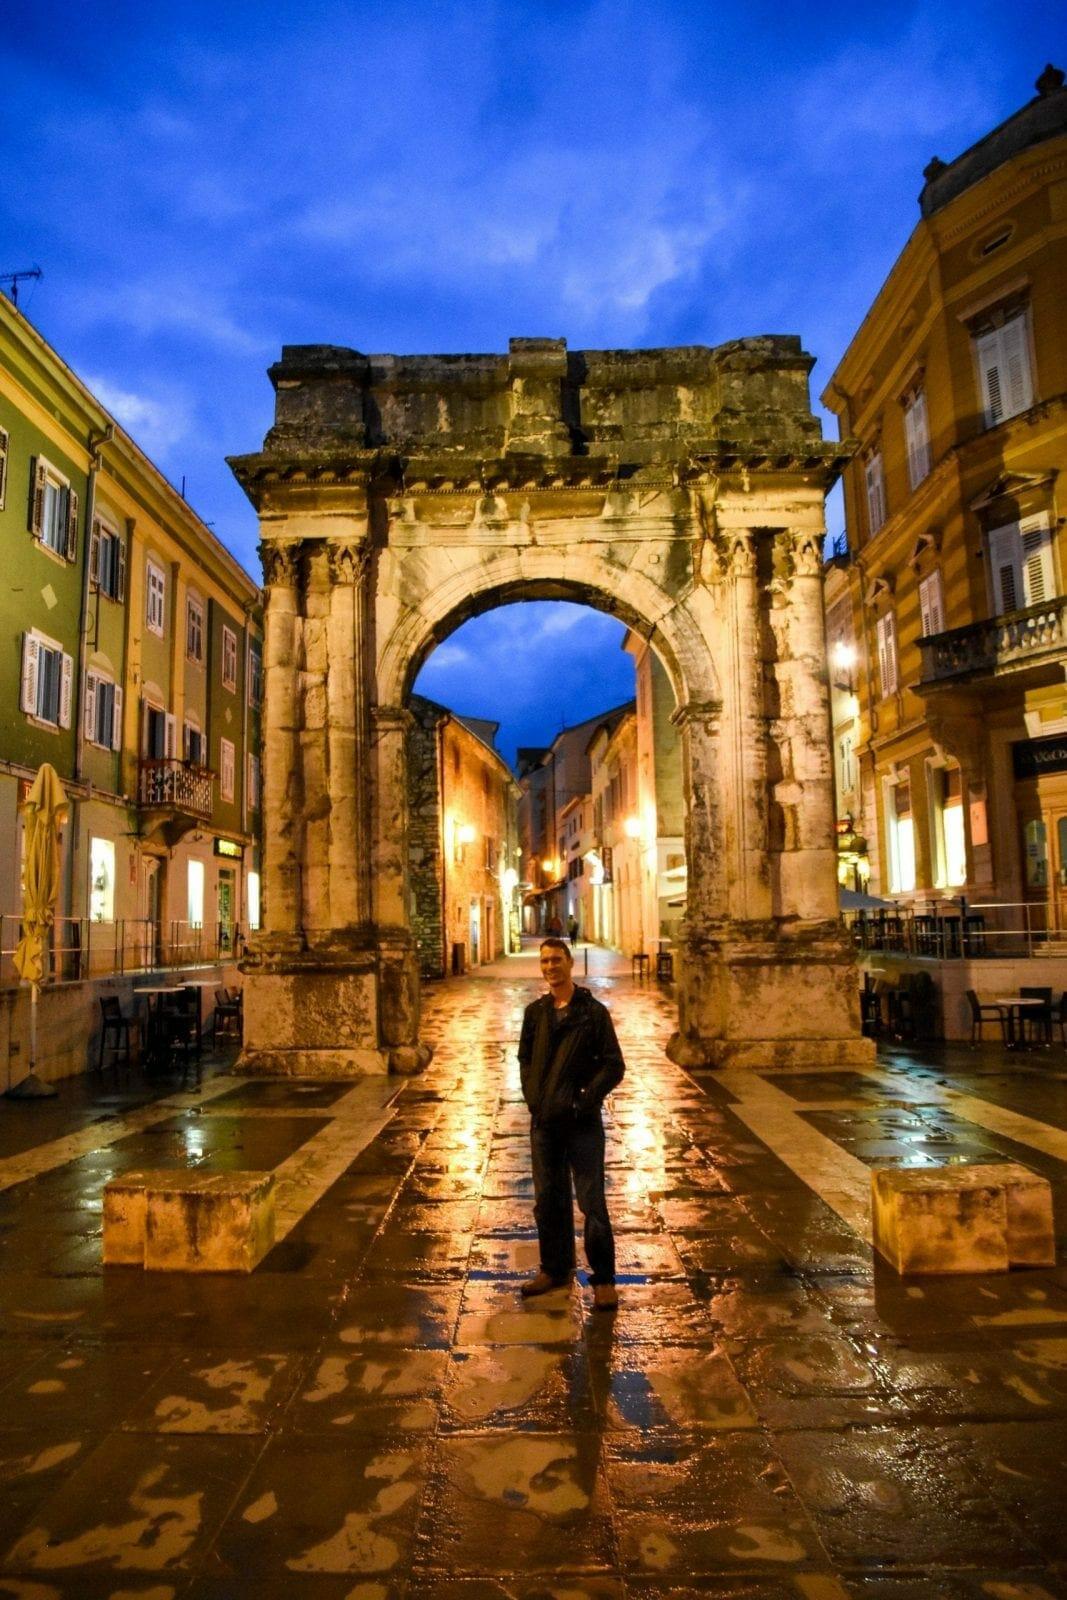 Arch of the Serfii, Pula, Croatia